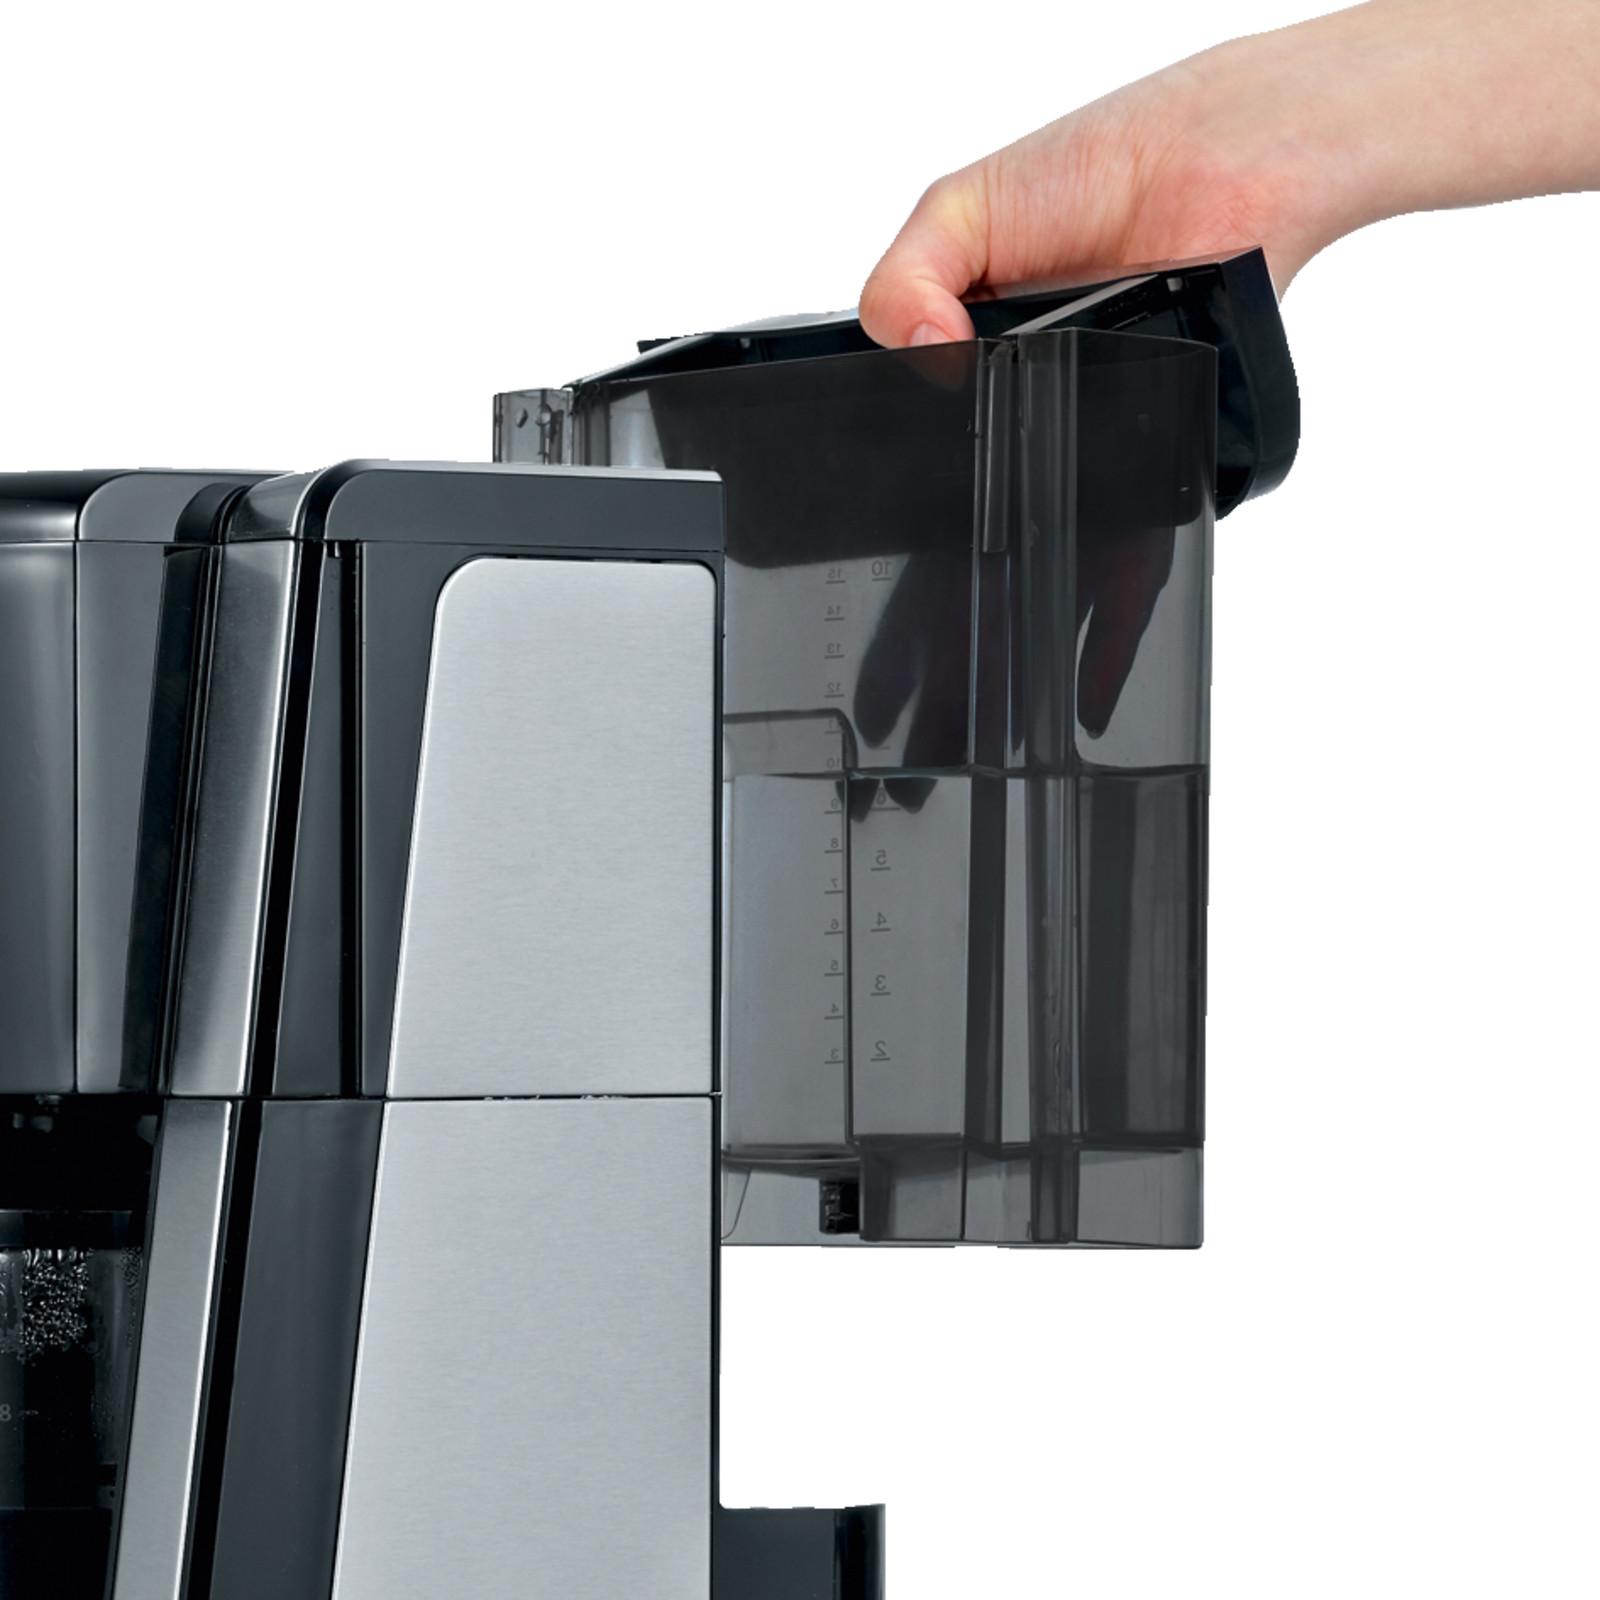 SEVERIN KA 4462, Kaffeemaschine, Edelstahl gebürstet